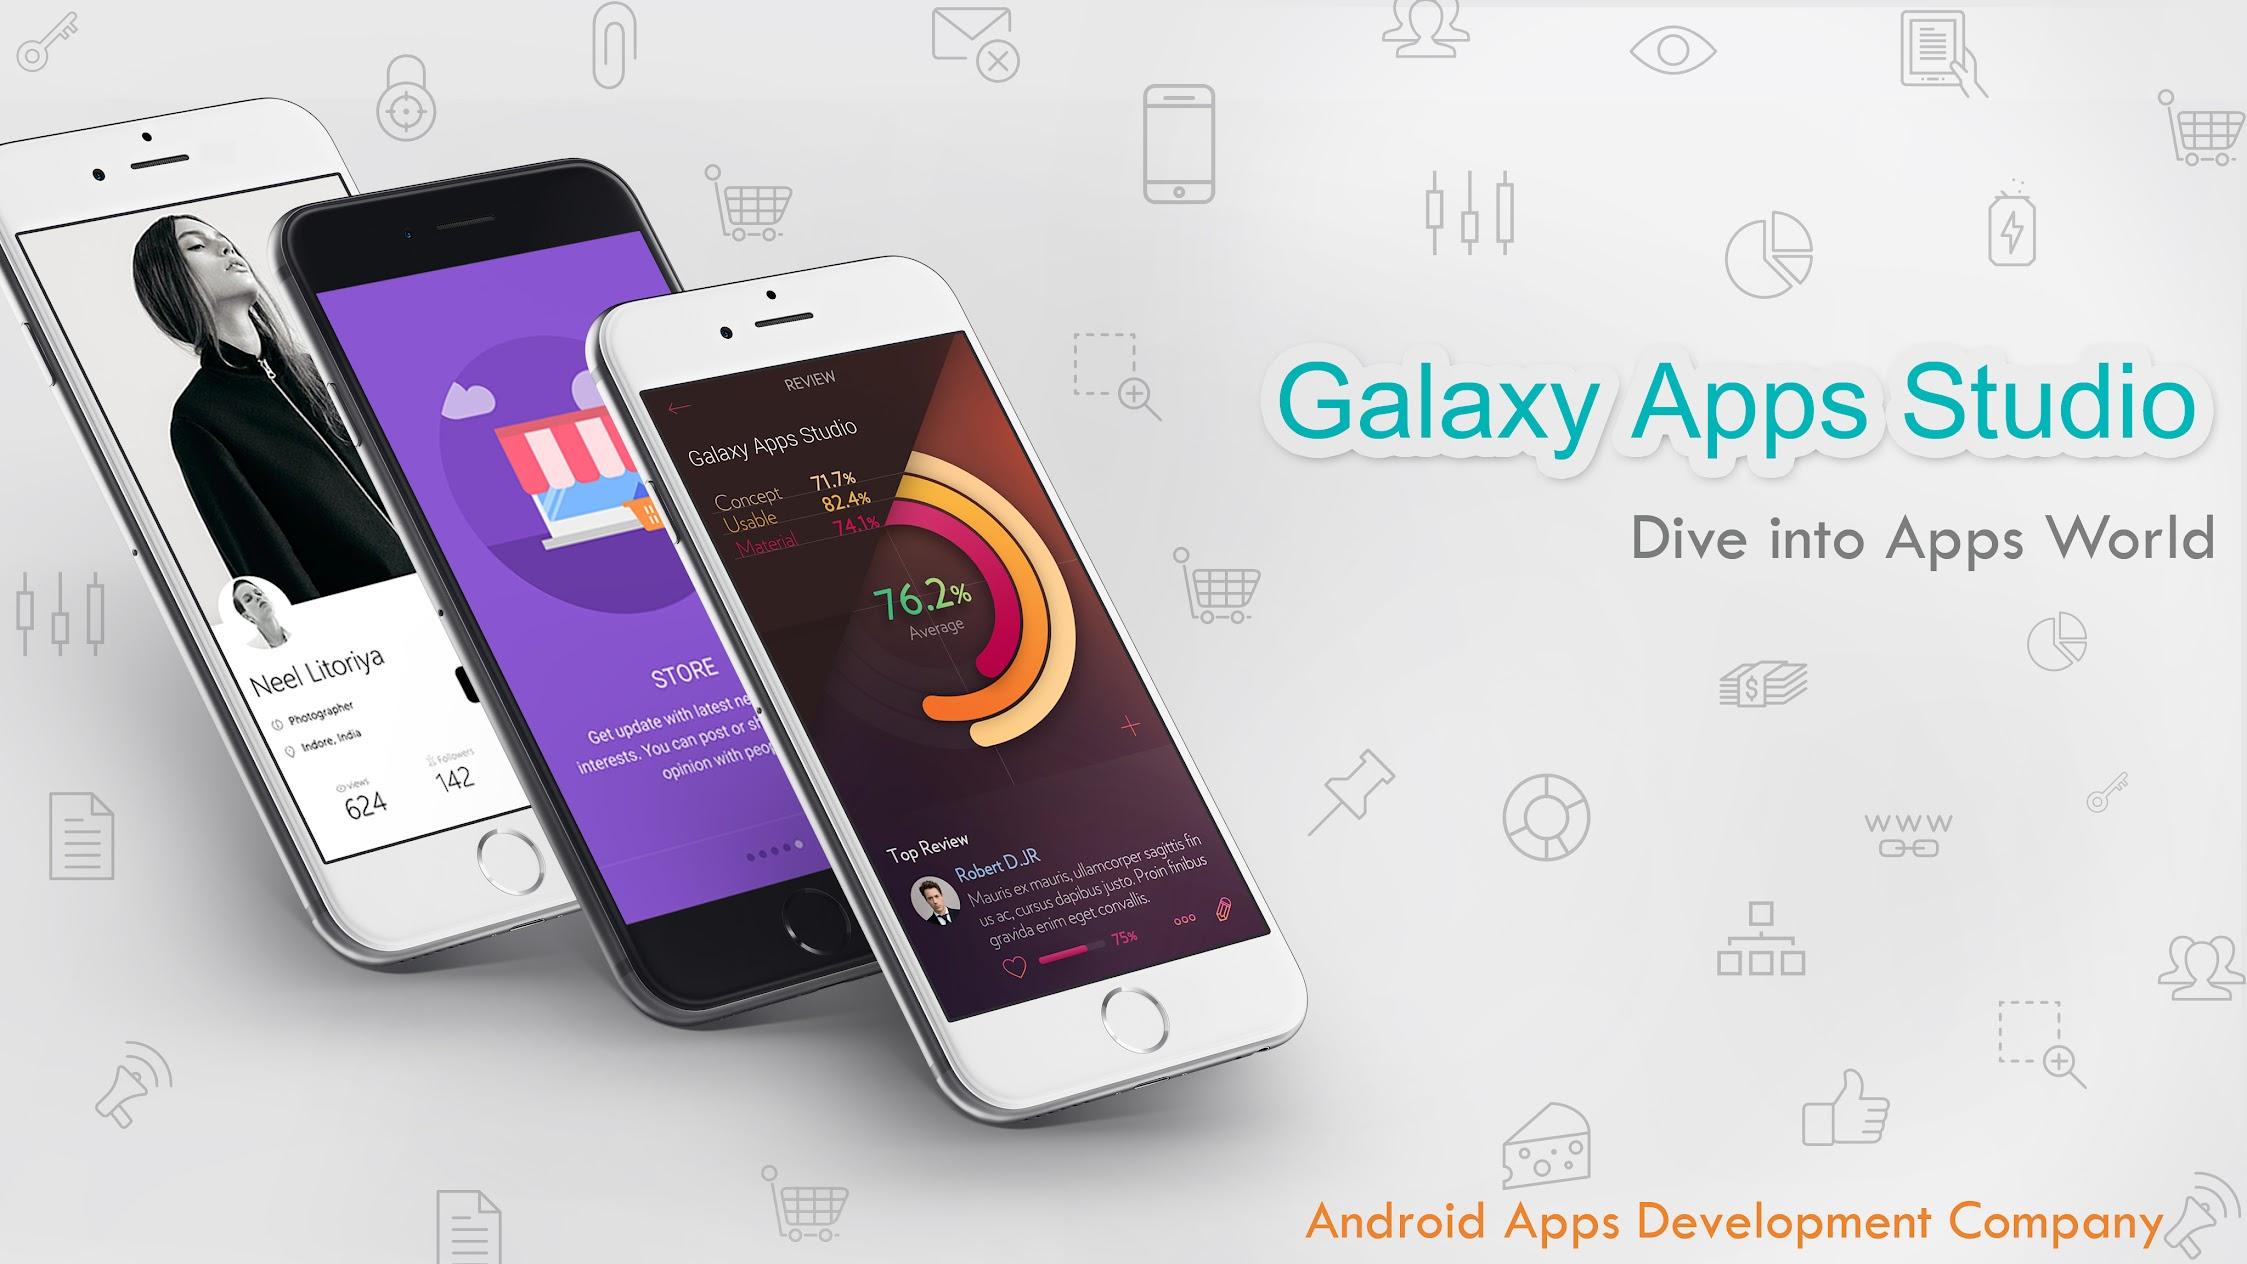 Galaxy Apps Studio